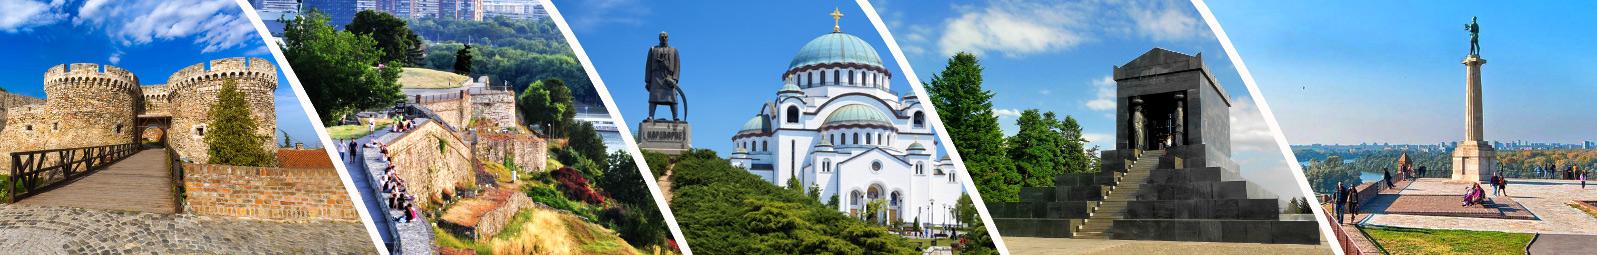 Znamenitosti Beograda